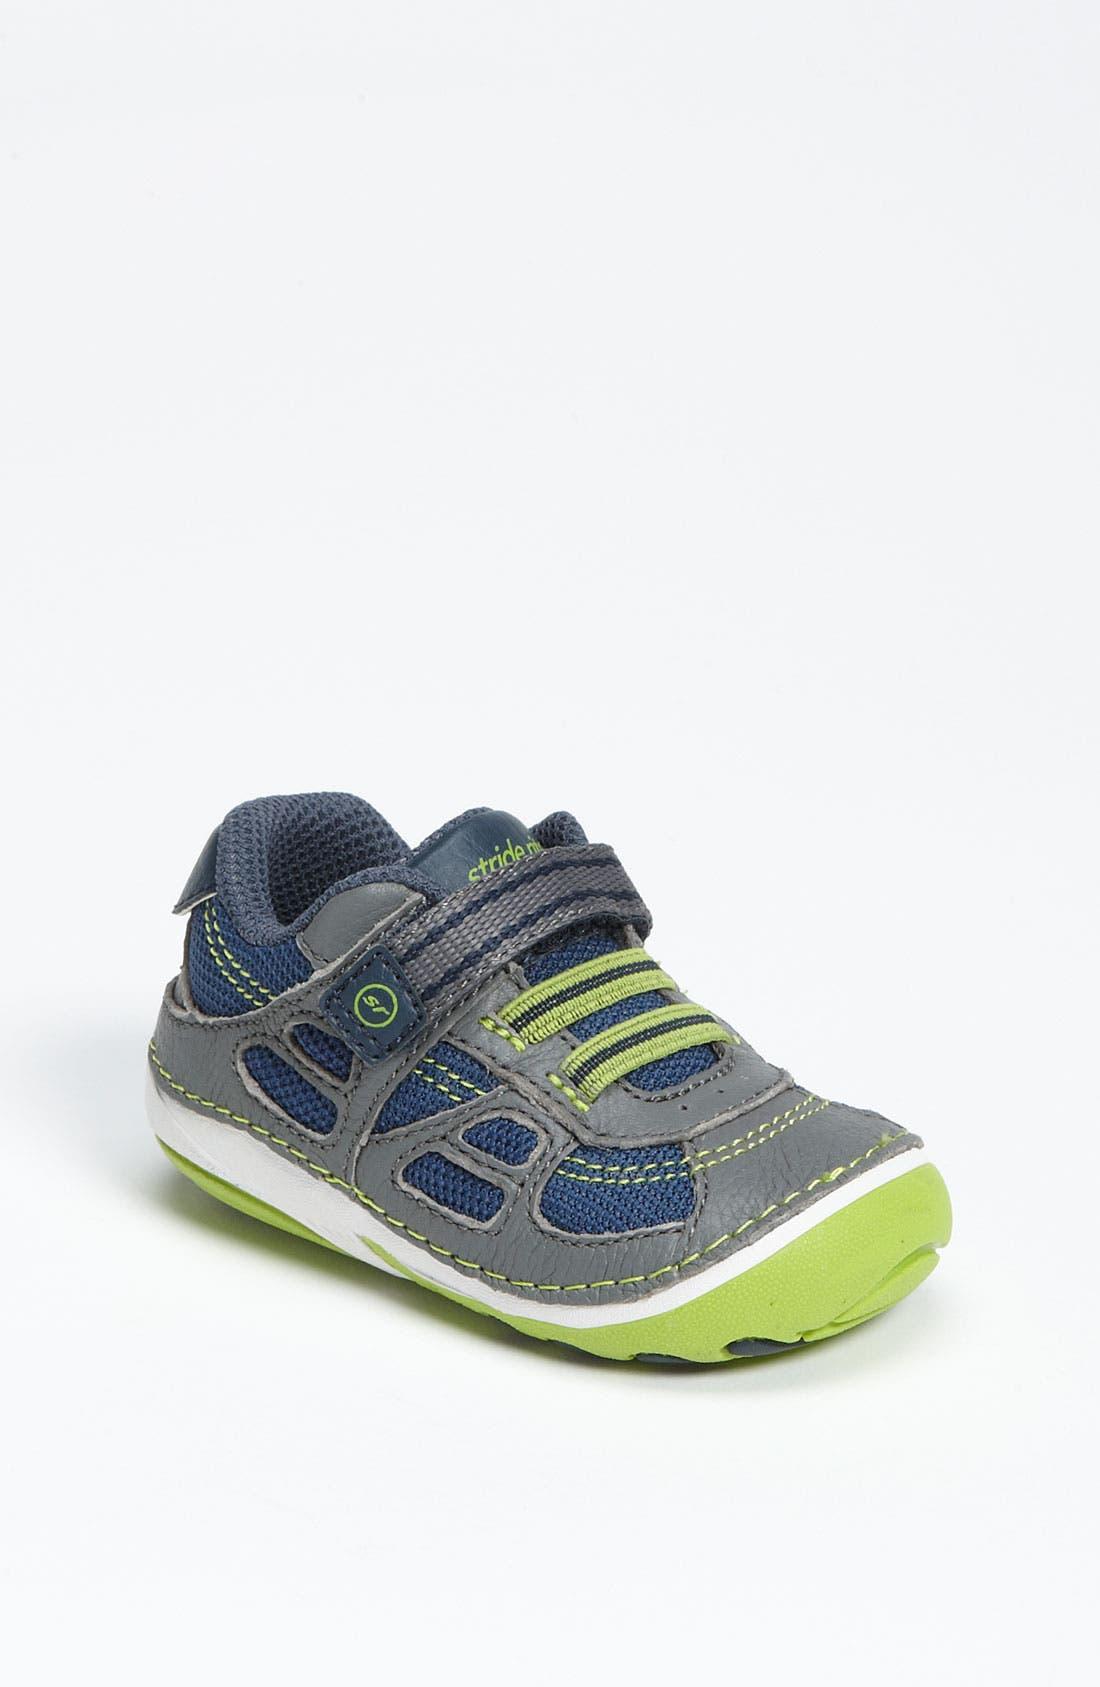 Main Image - Stride Rite 'Conner' Sneaker (Baby & Walker)